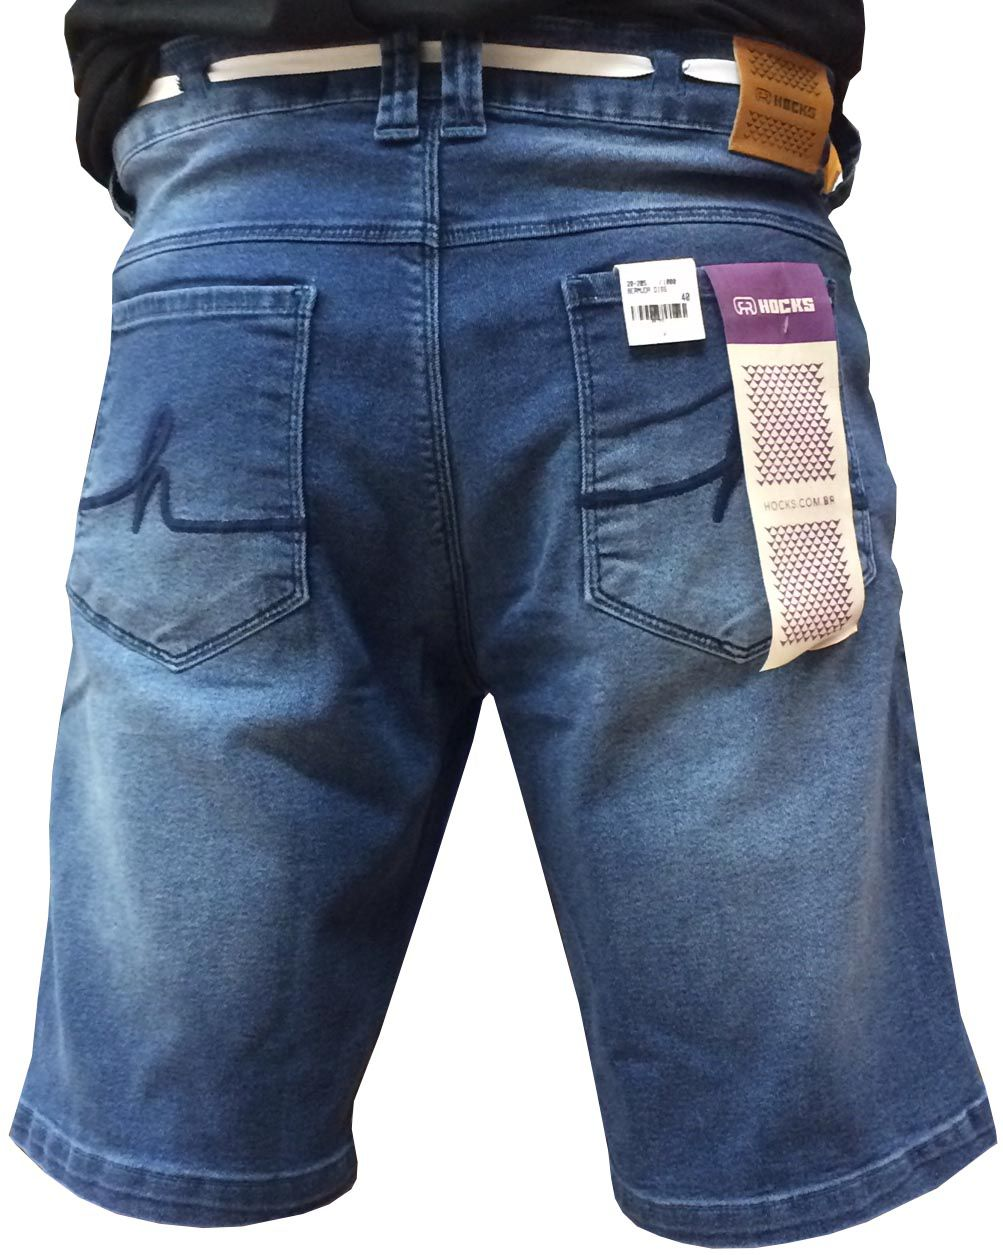 Bermuda Hocks Jeans 20-205 Masculina